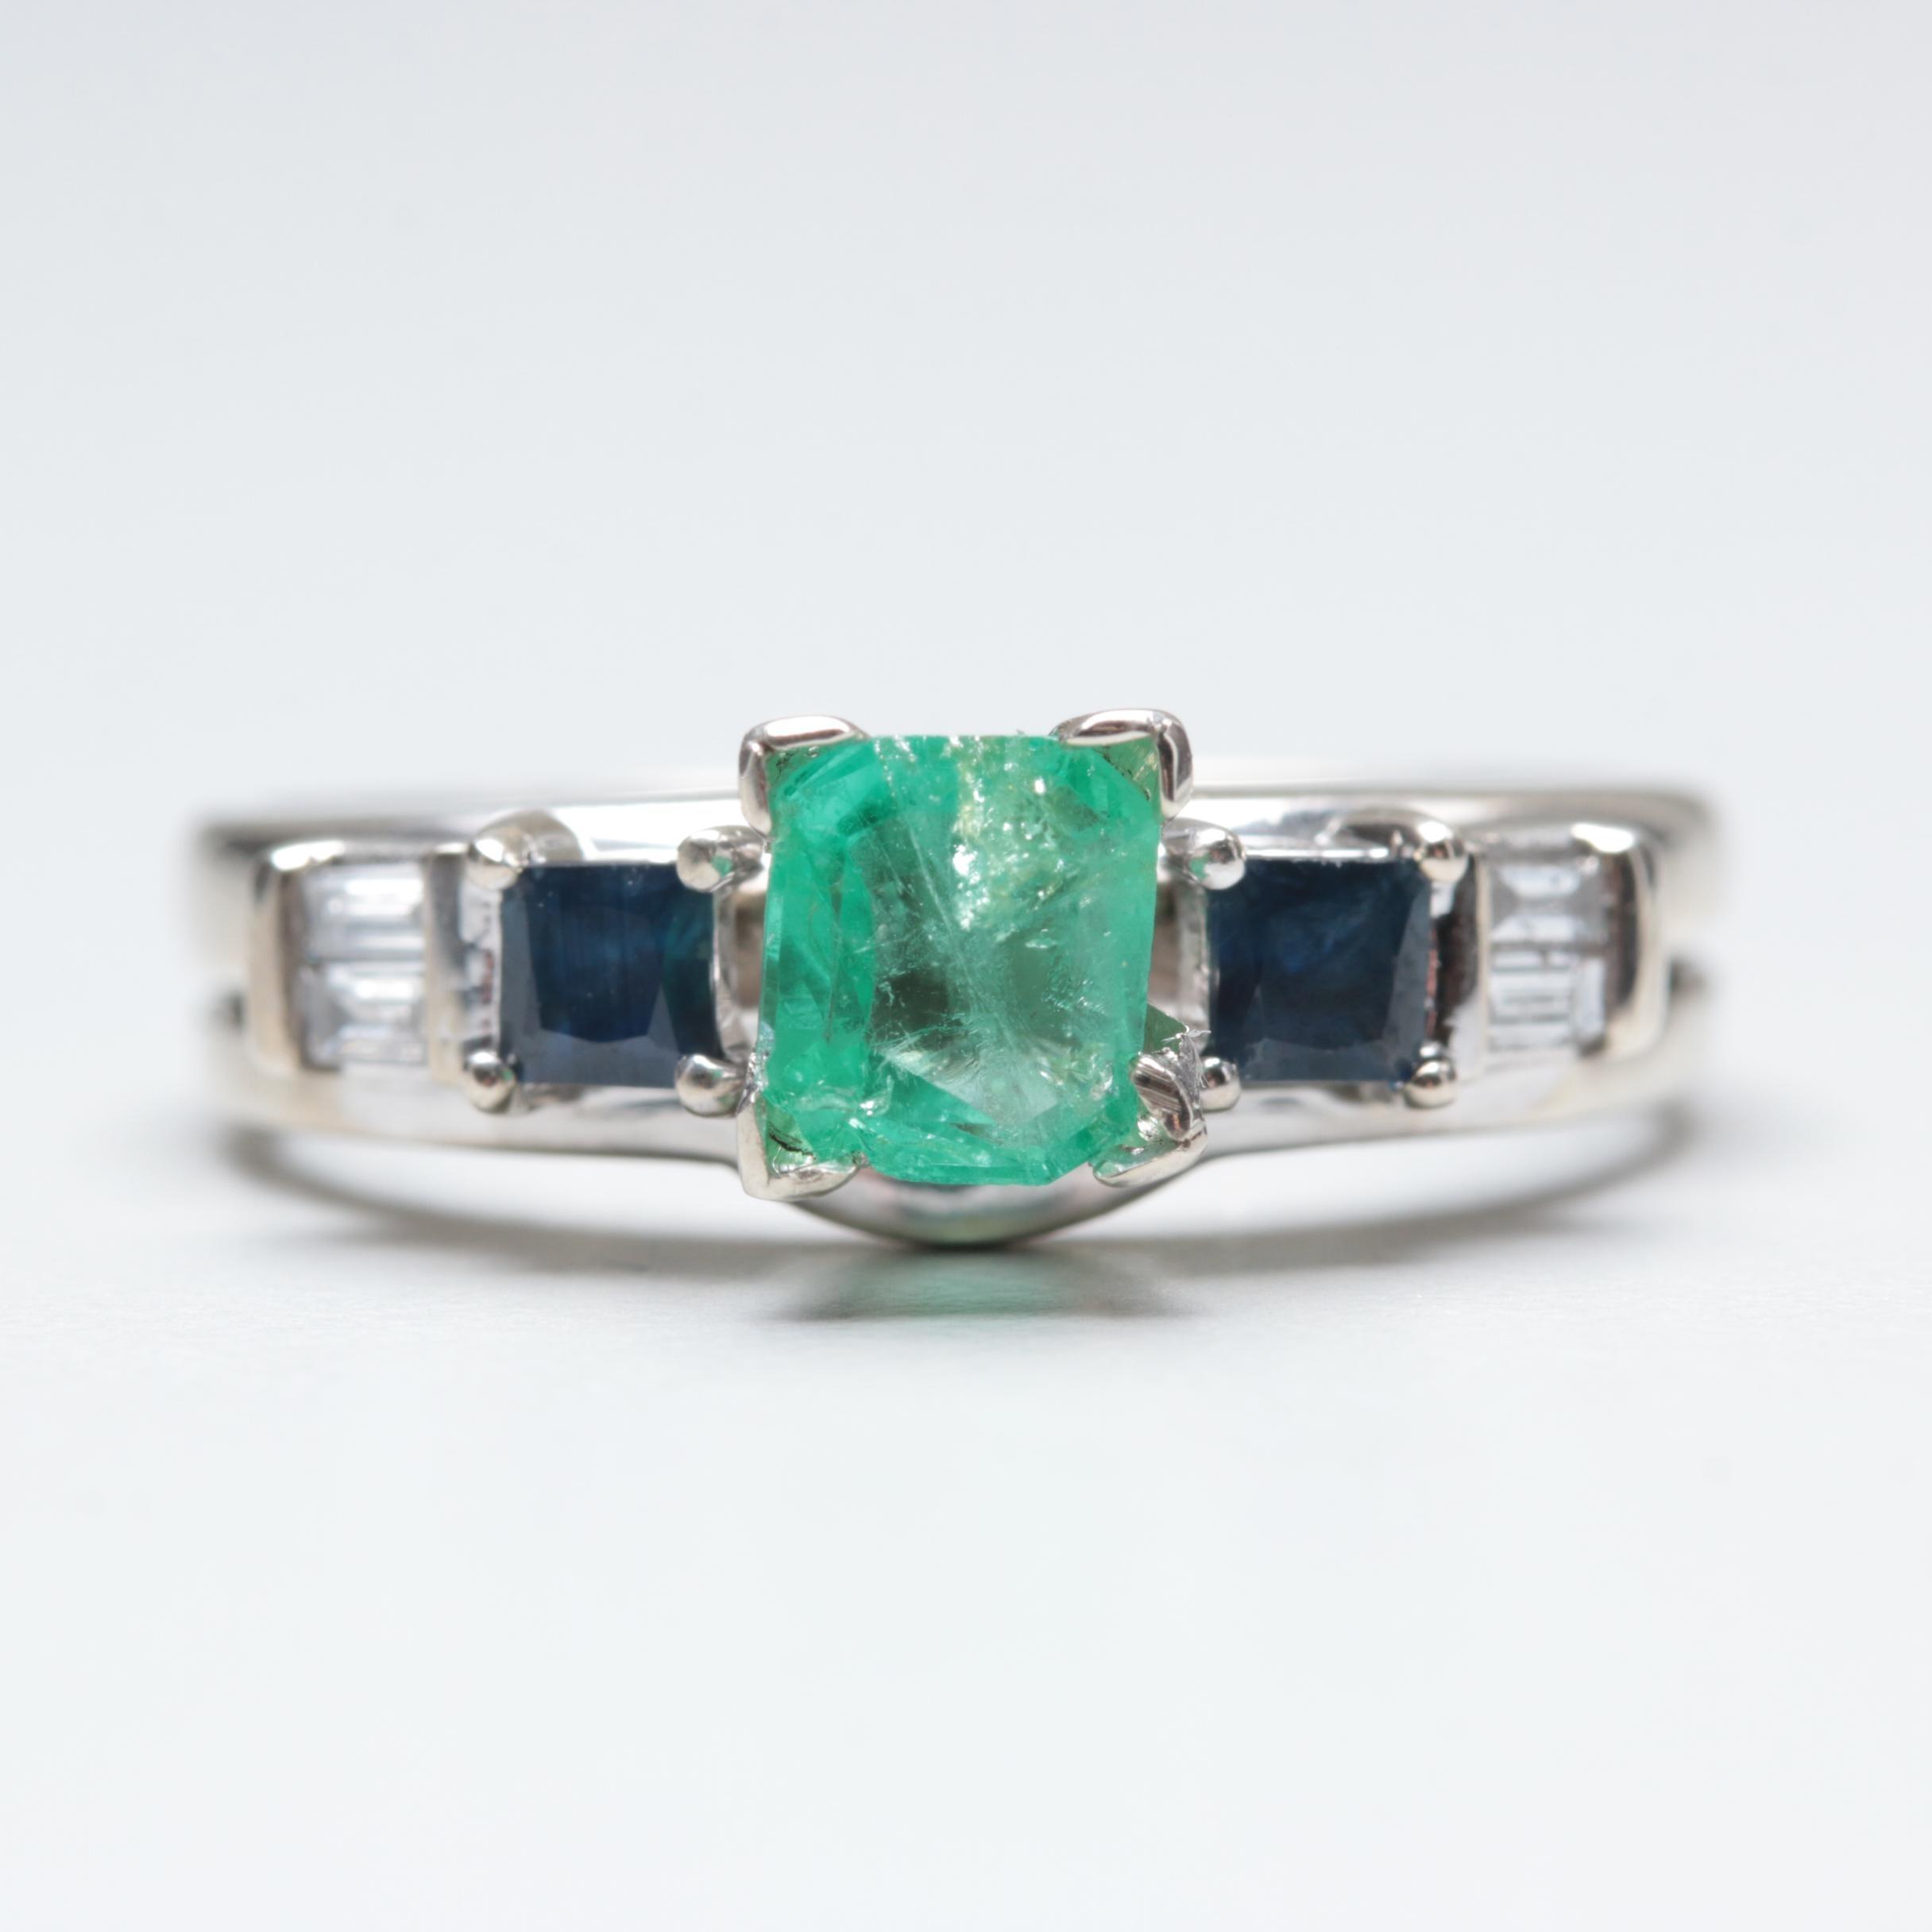 14K White Gold Emerald, Blue Sapphire and Diamond Ring